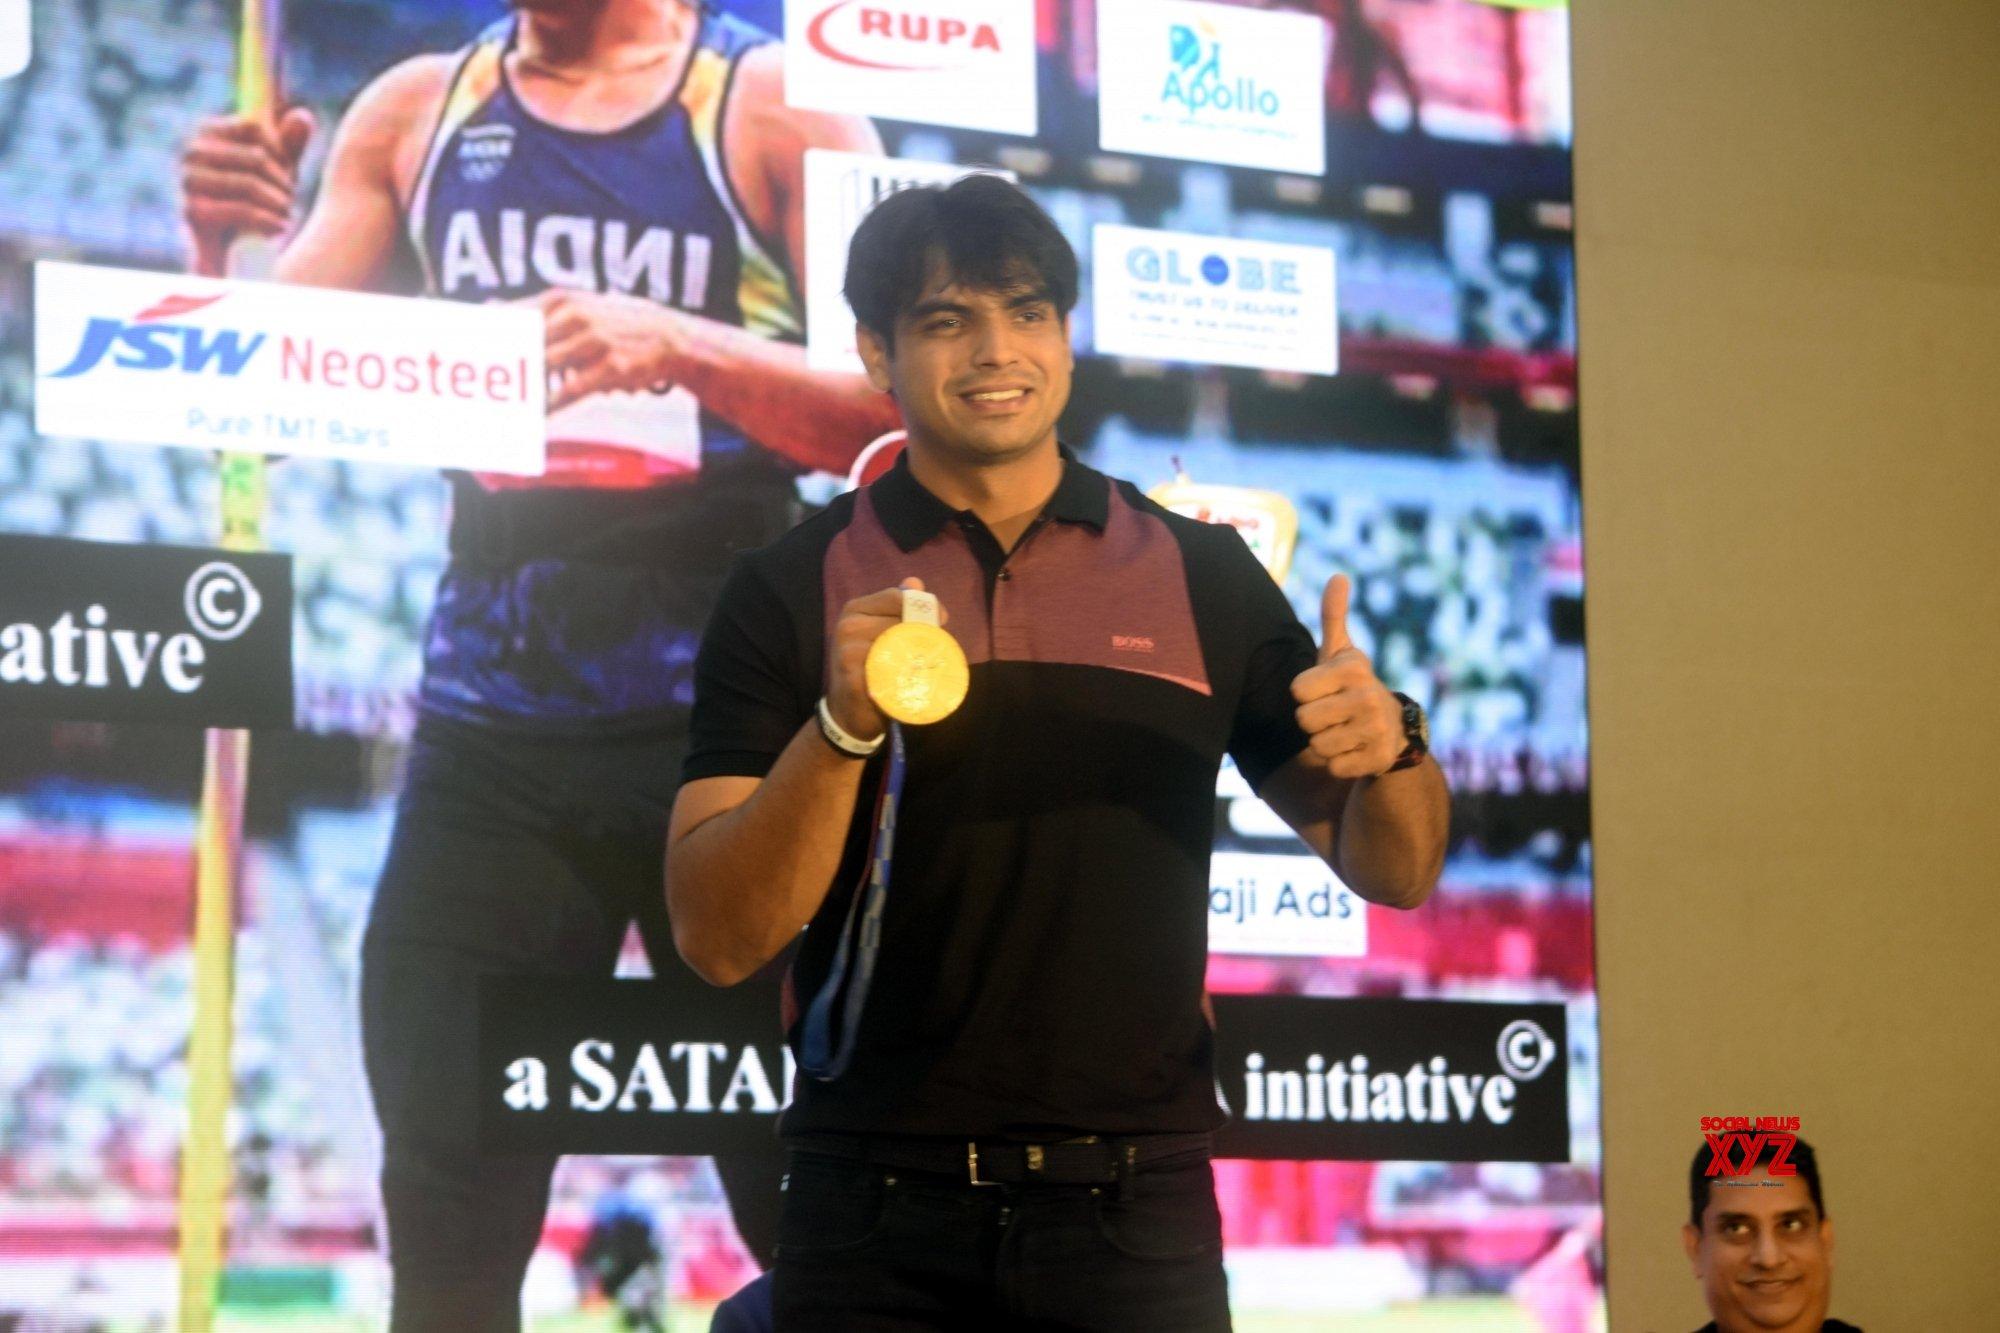 Kolkata : Tokyo Olympic gold medallist javelin thrower Neeraj Chopra during a promosonal program in Kolkata on Sep 15, 2021. #Gallery